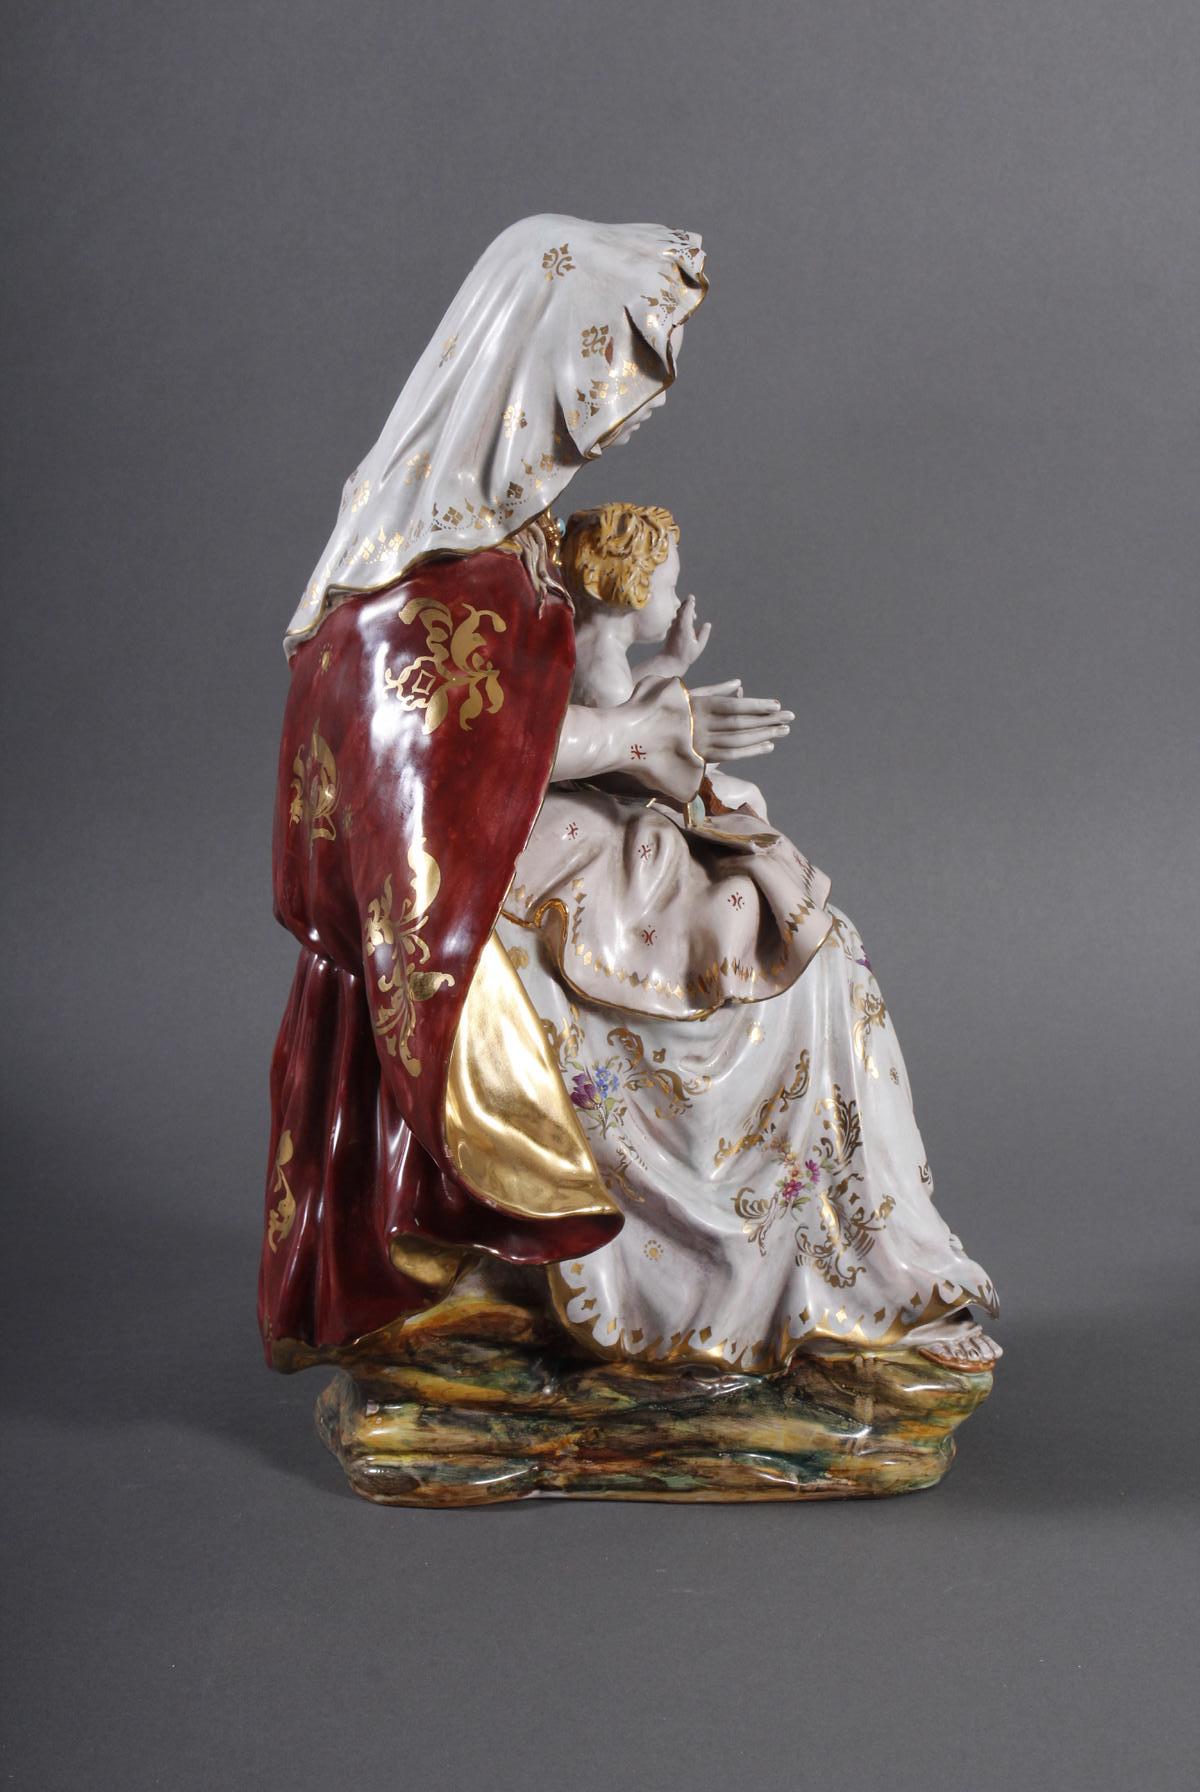 Keramik-Skulptur Madonna mit Kind, wohl Italien 2. Hälfte 20. Jh.-6